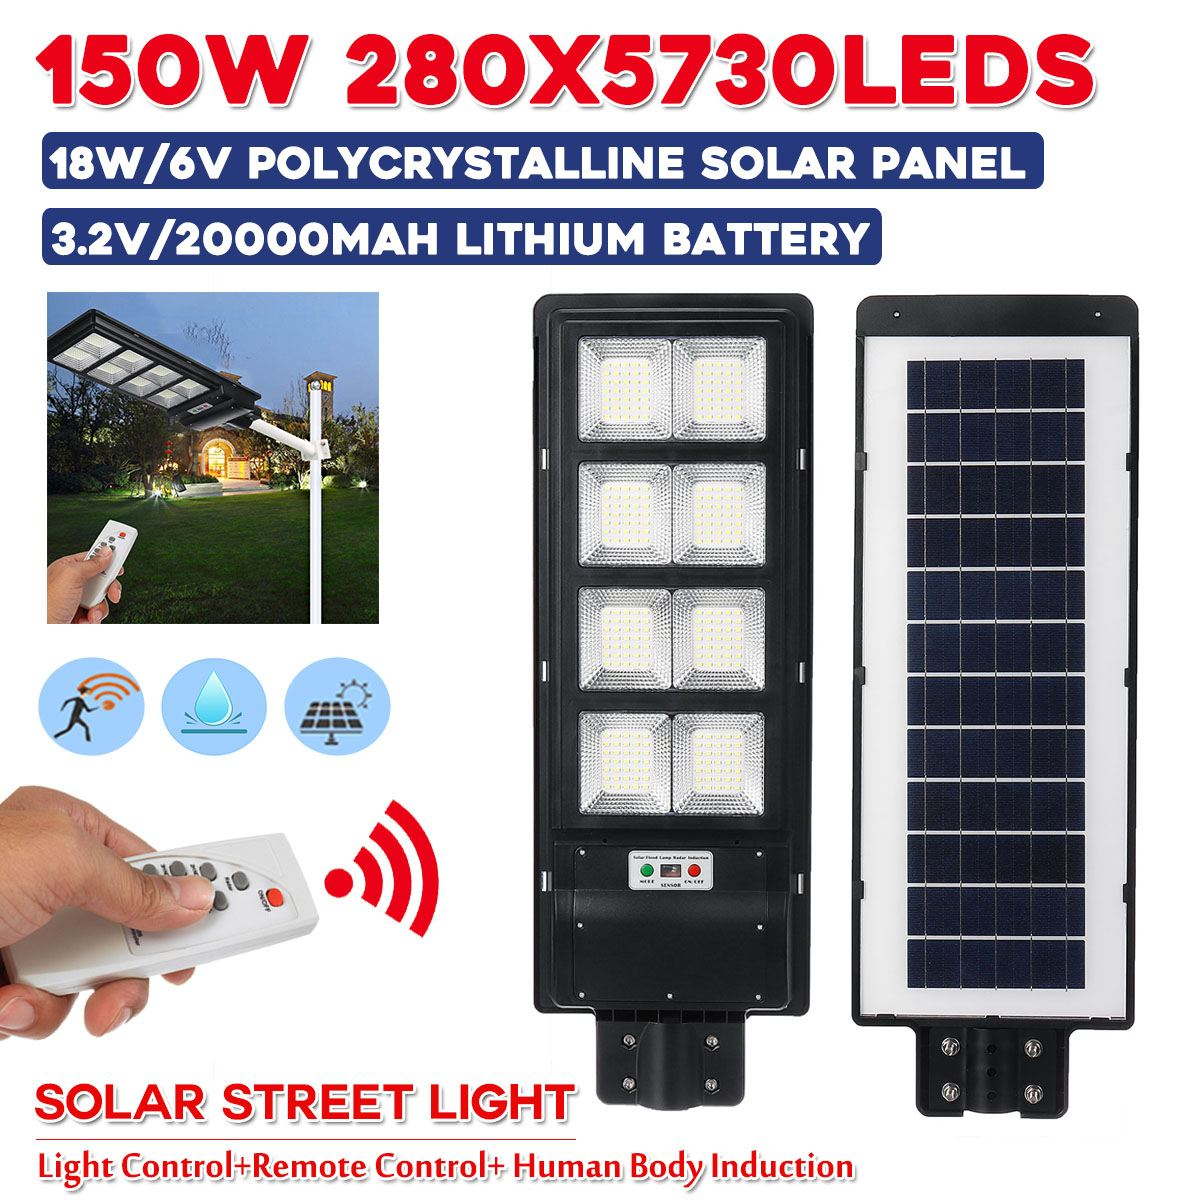 150w 280LEDs Solar Street Light IP67 Waterproor 3 Modes PIR Motion Sensor LED Outdoor Garden W/Remote Controller Light Control